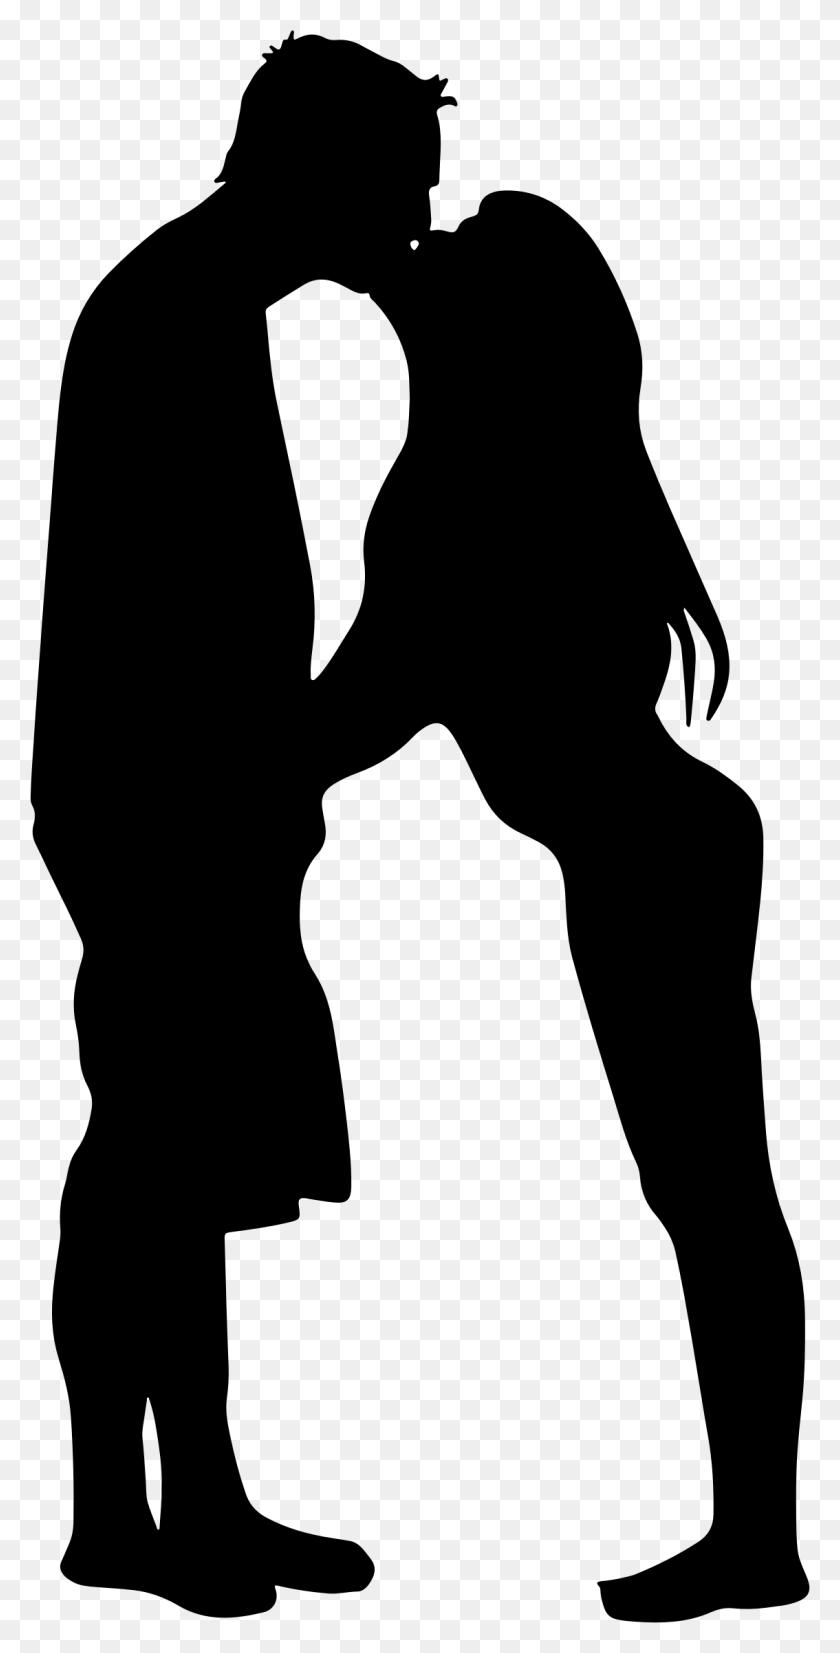 Png Kissing Couple Transparent Kissing Couple Images - Couple PNG